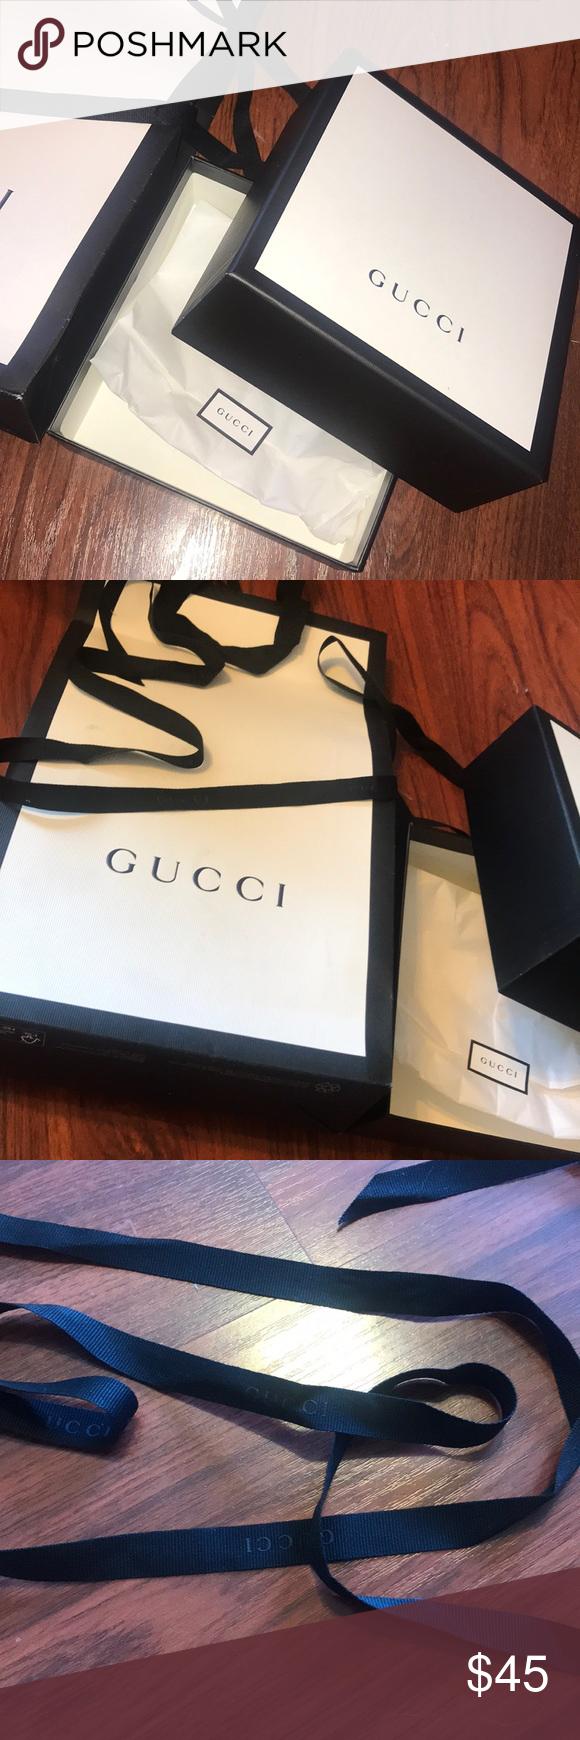 e54e2f1b3f98 Gucci Gift Bag/Box Set Selling a Gucci Shopping Bag, Gucci Box, Gucci